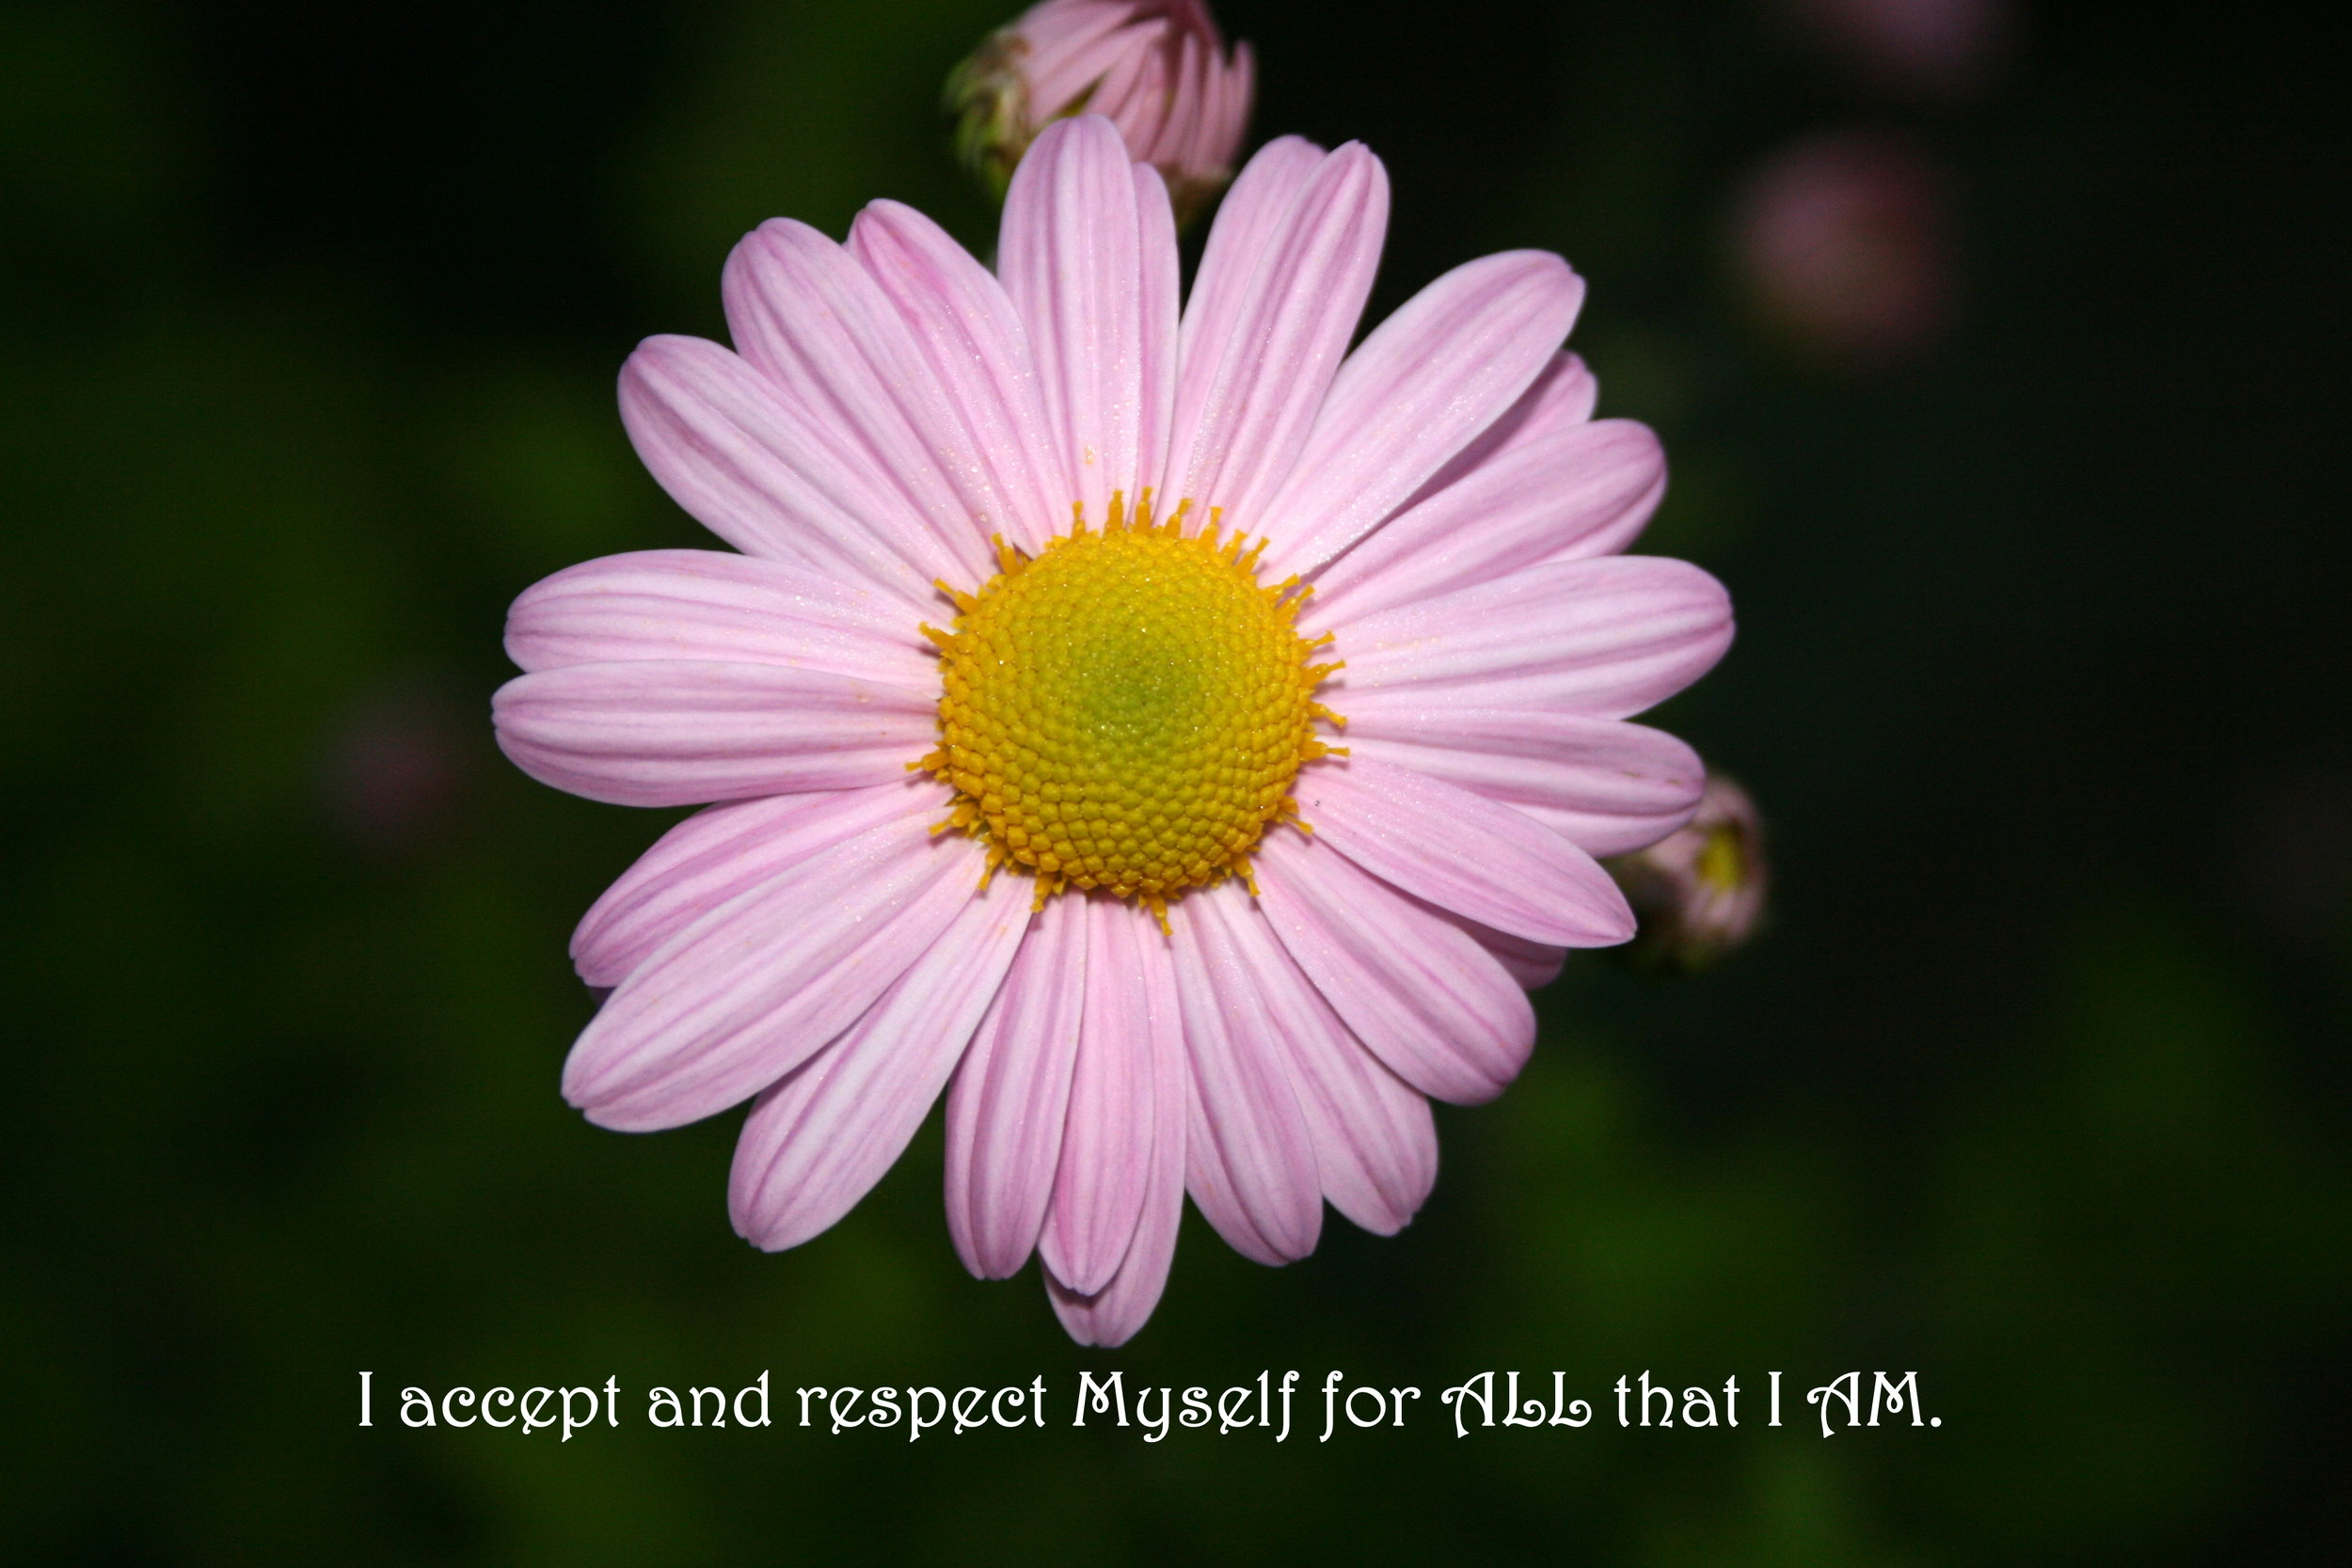 Daisy_Accept and Respect.jpg